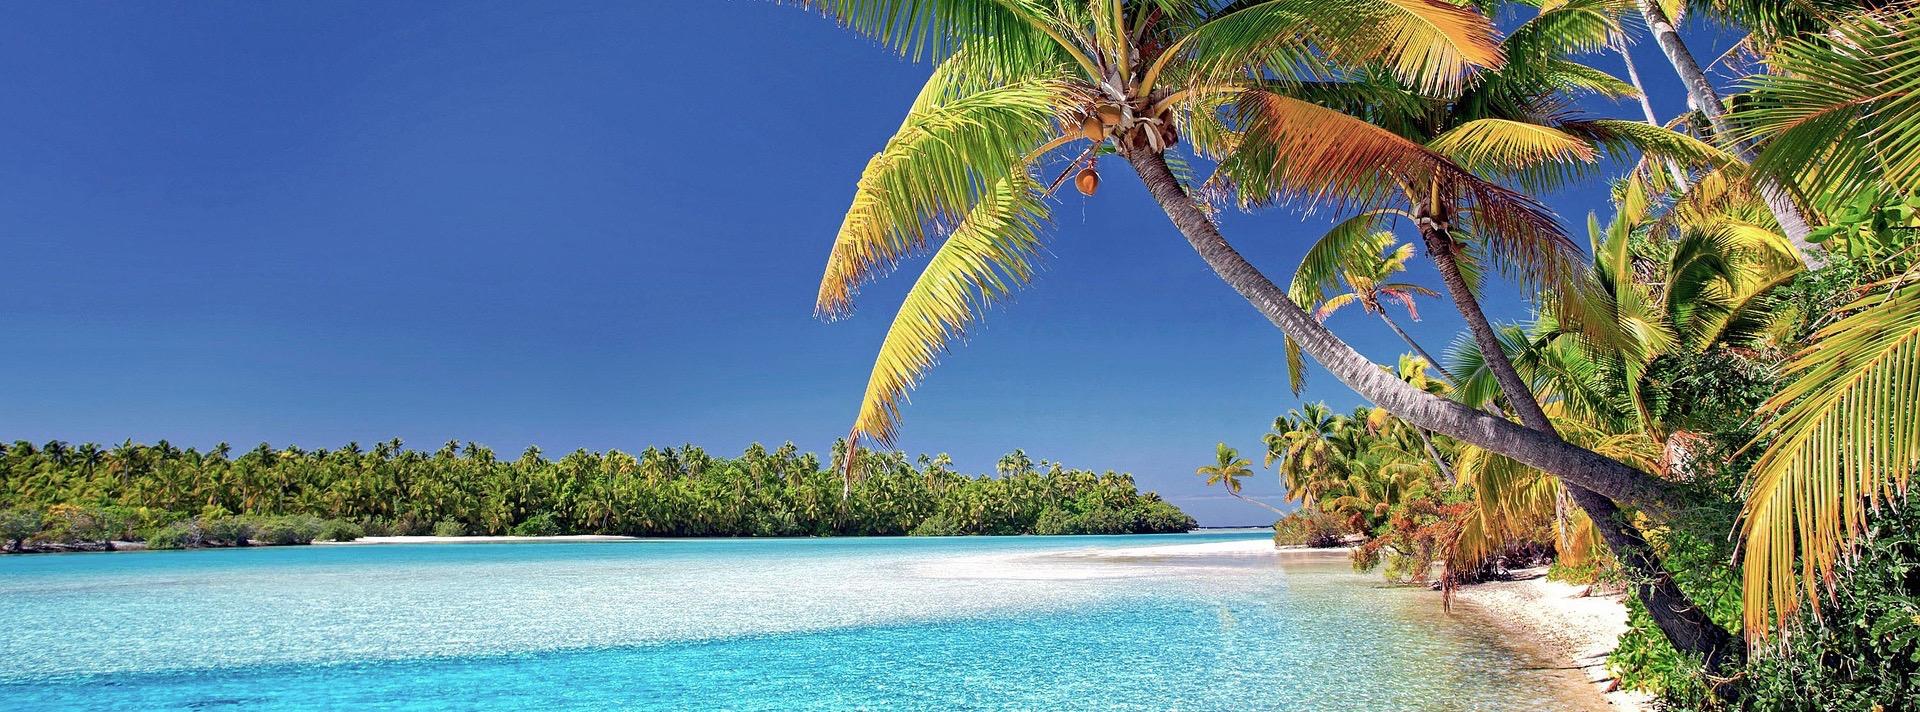 Cookinseln Urlaub